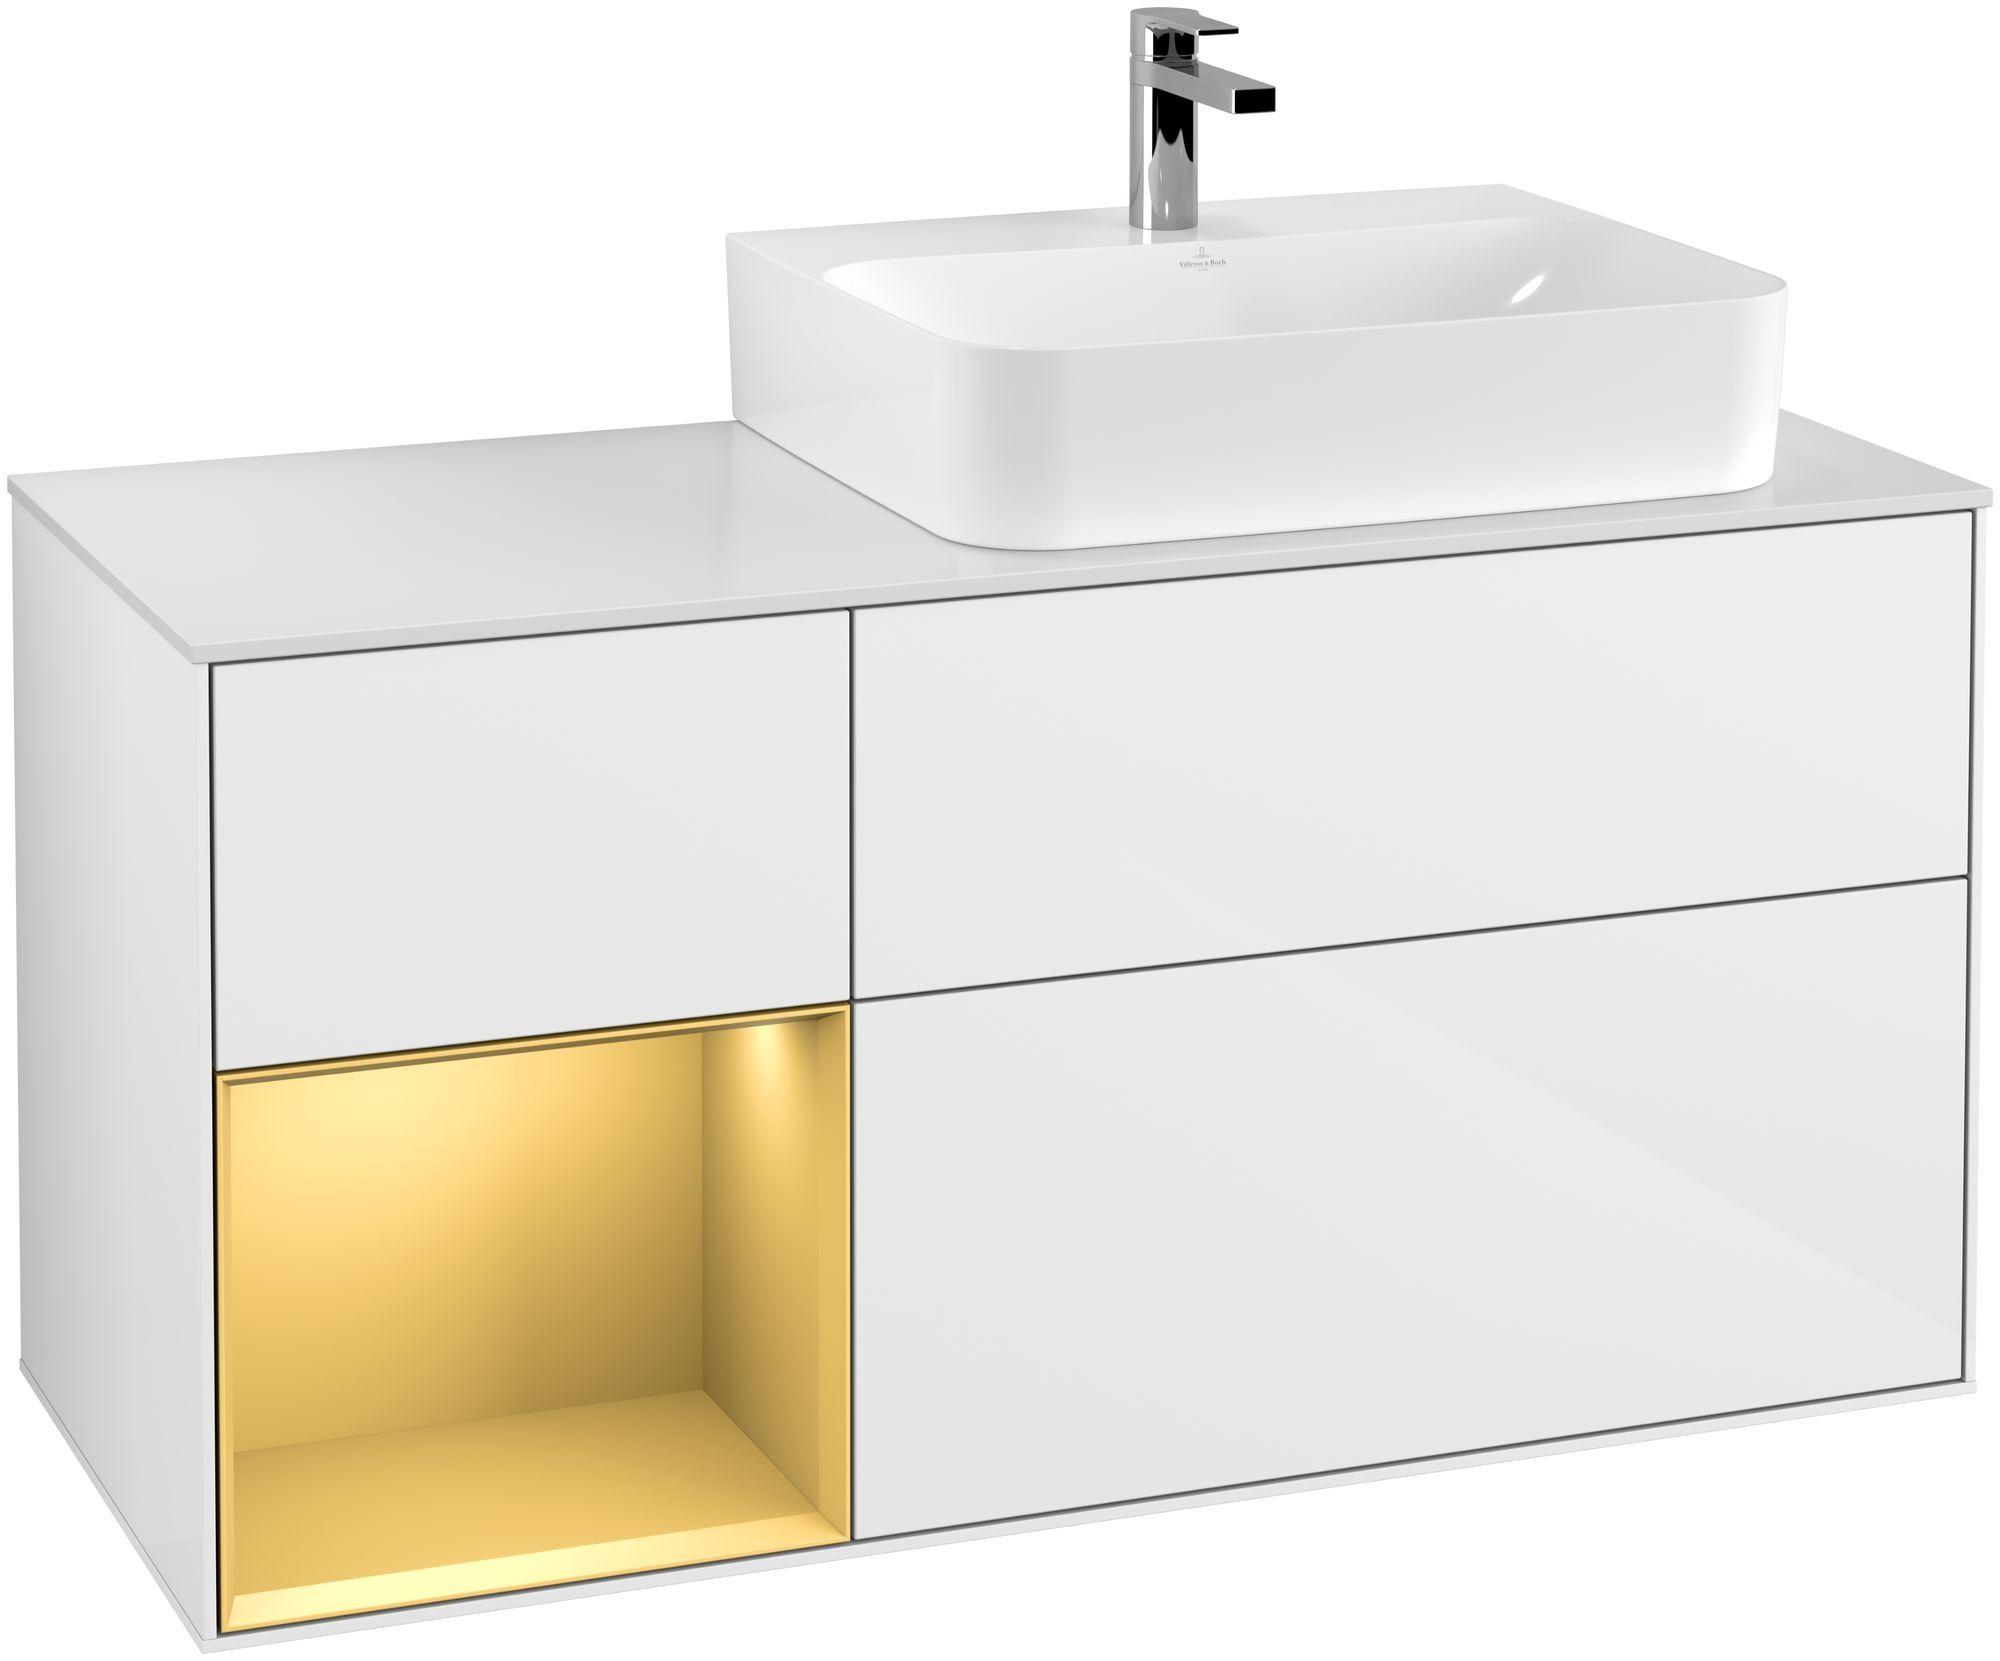 Villeroy & Boch Finion G14 Waschtischunterschrank mit Regalelement 3 Auszüge Waschtisch rechts LED-Beleuchtung B:120xH:60,3xT:50,1cm Front, Korpus: Glossy White Lack, Regal: Gold Matt, Glasplatte: White Matt G141HFGF